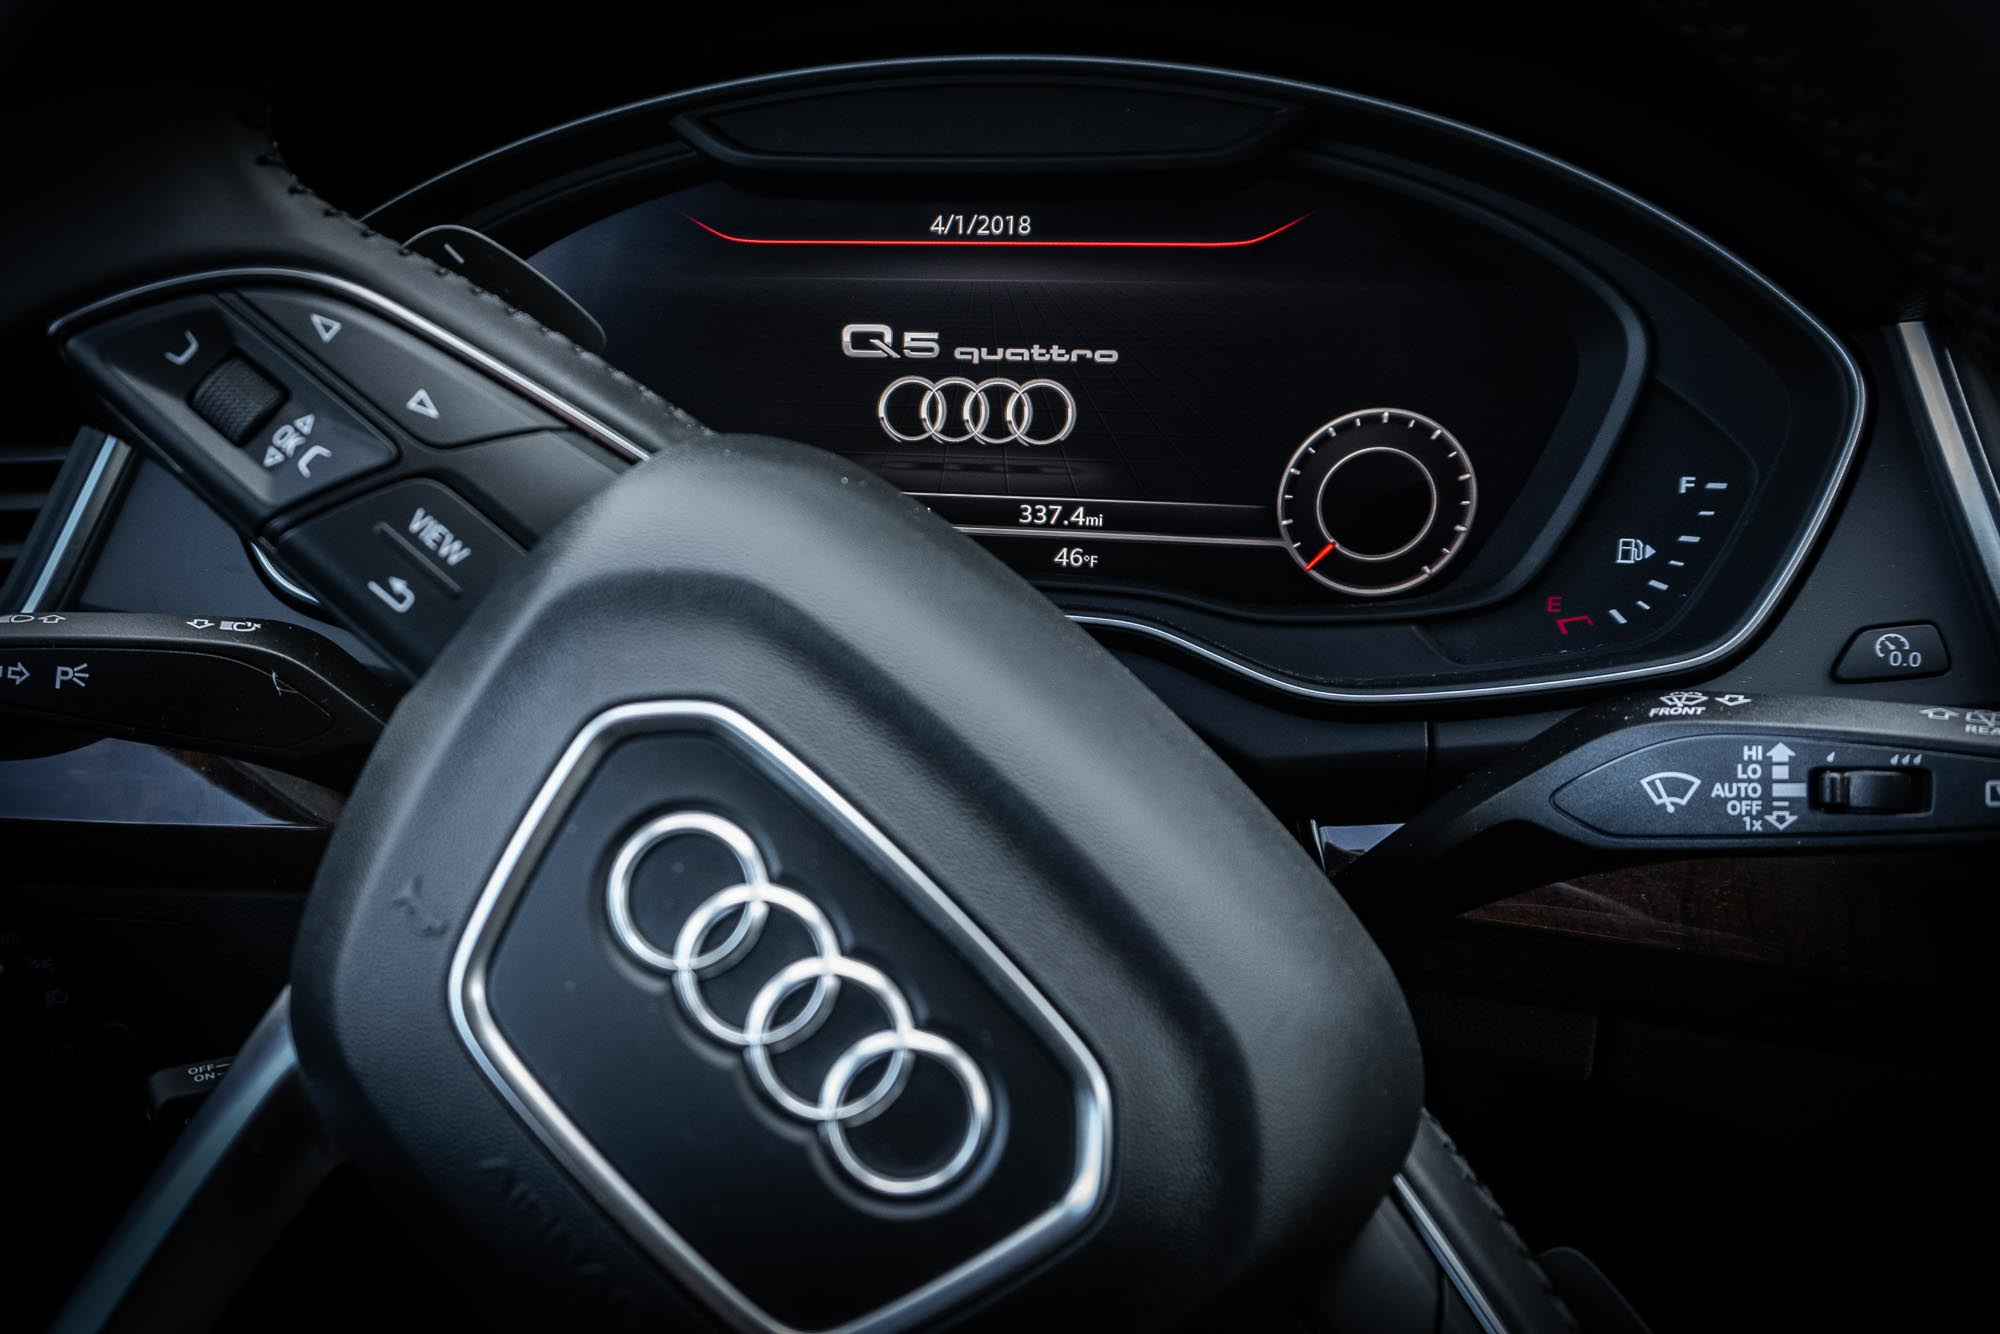 Pratt_Silvercar Audi_028.jpg